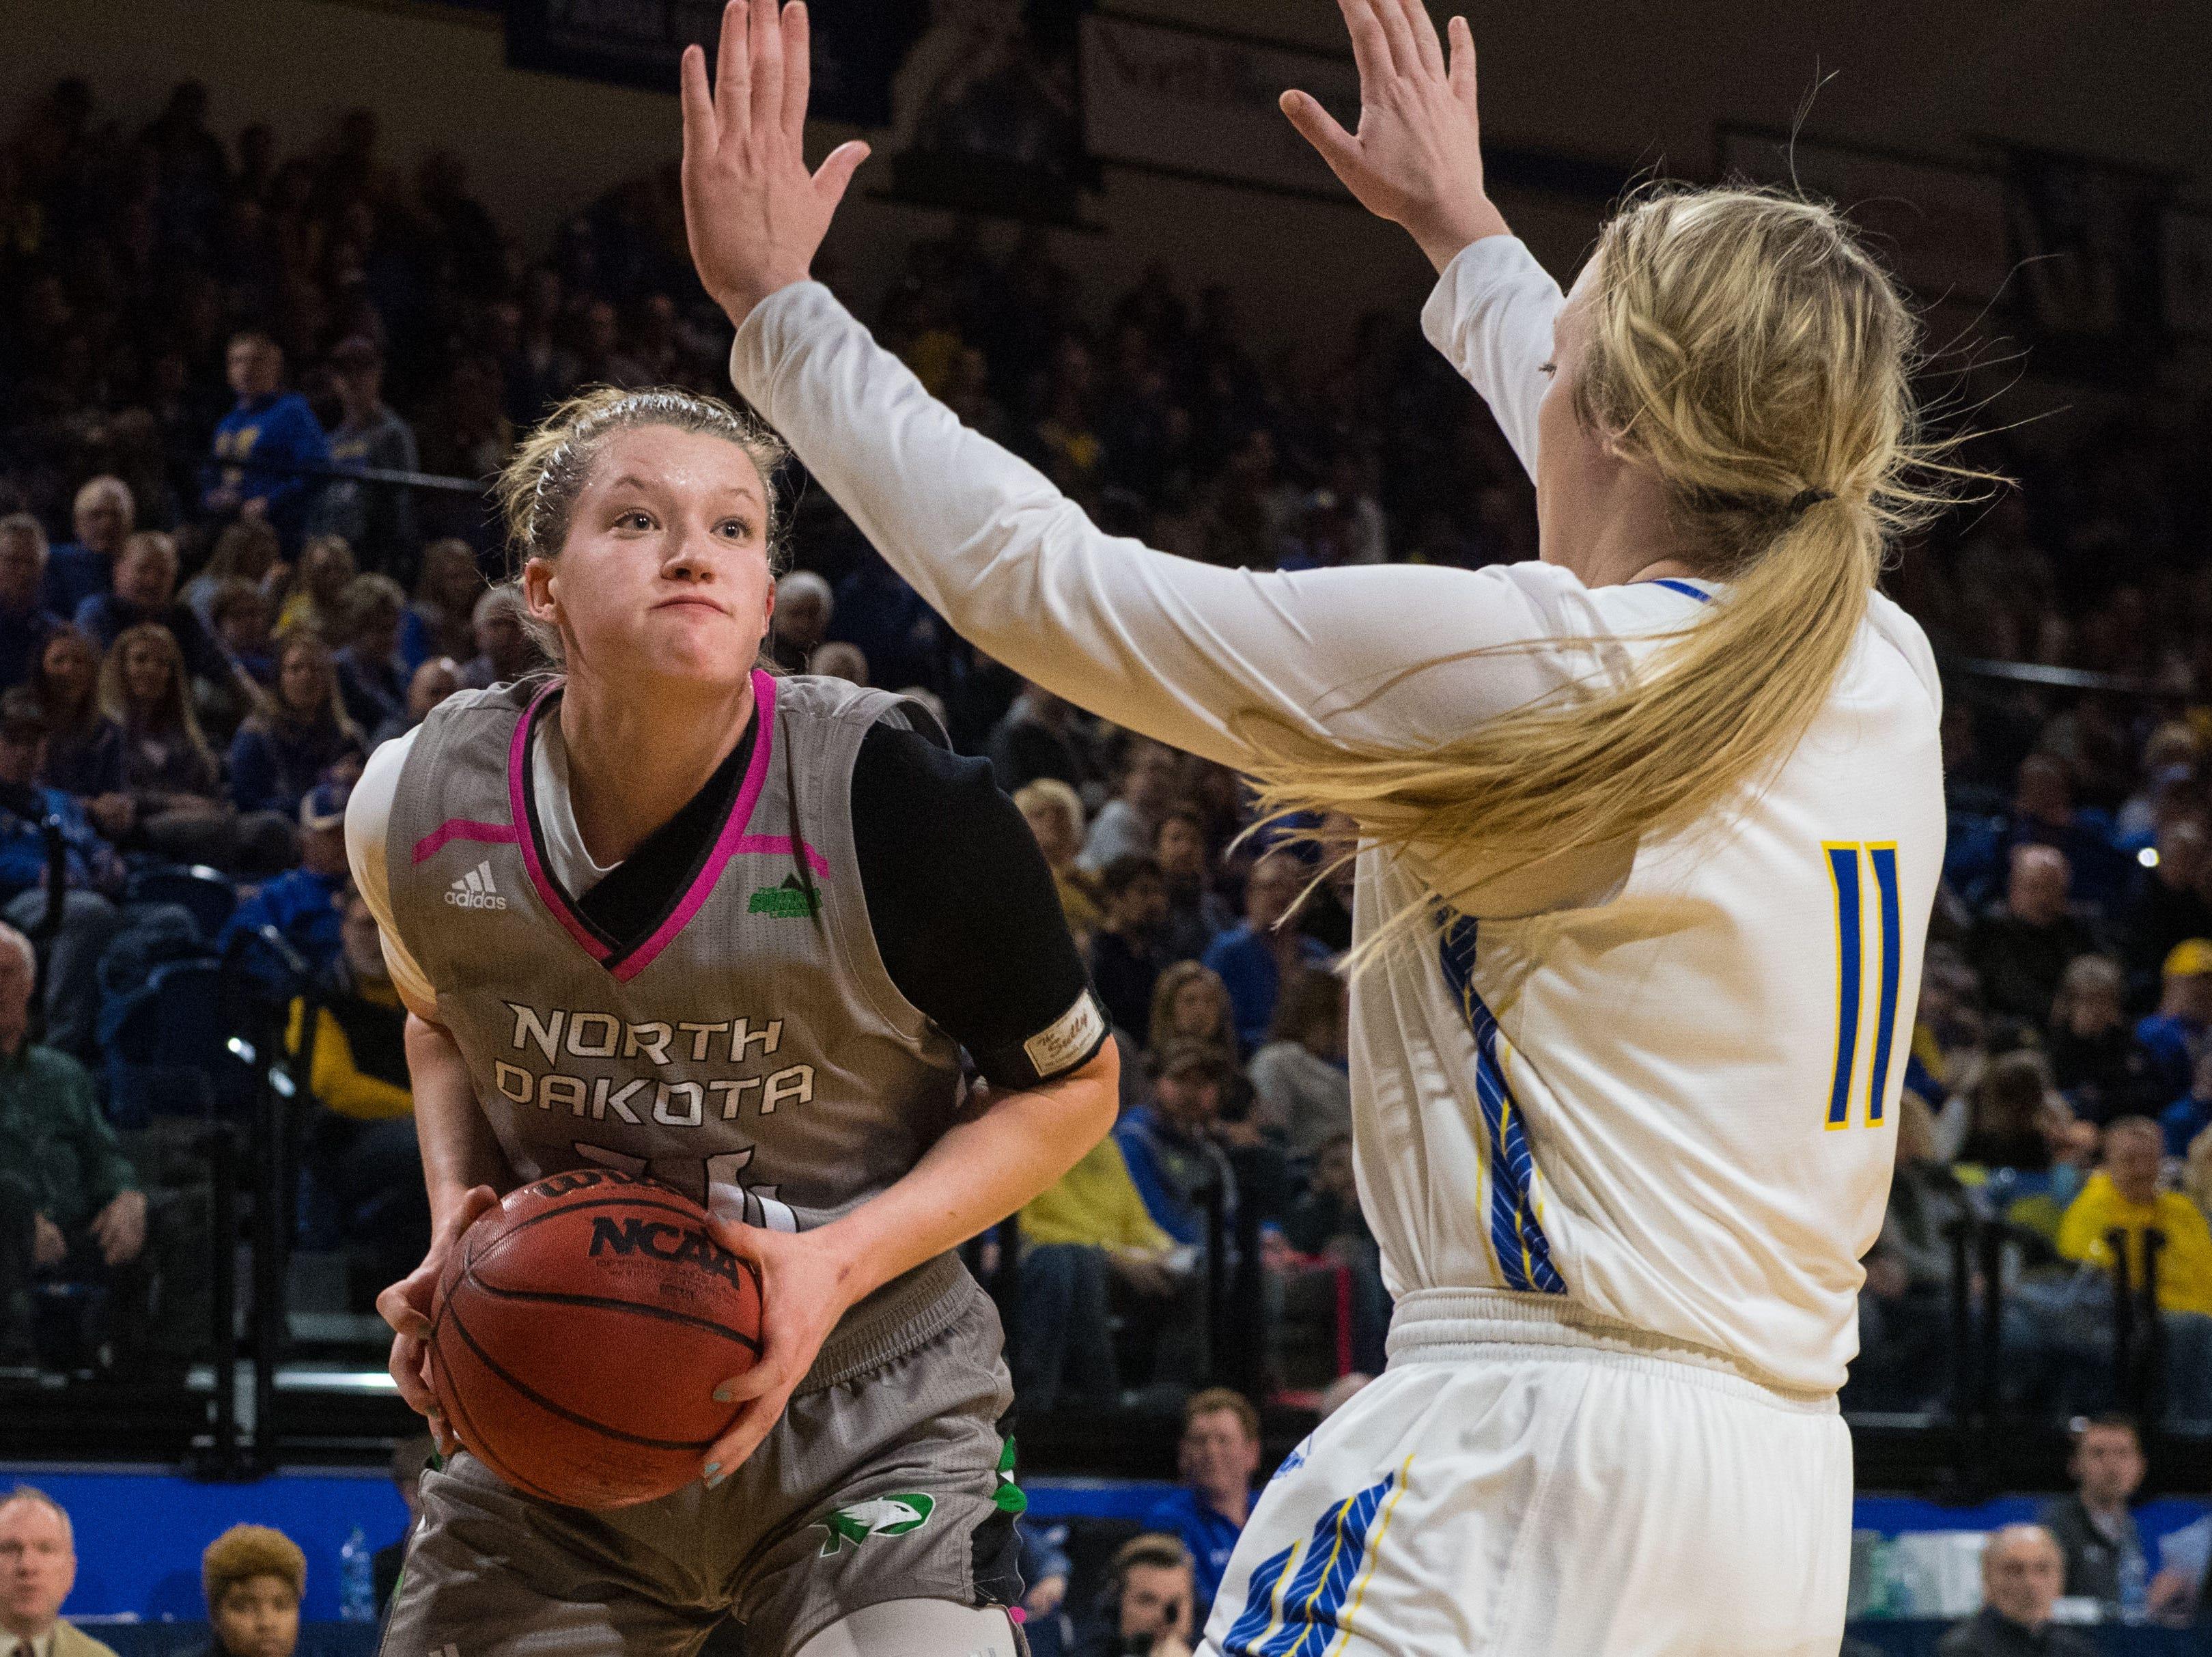 South Dakota State's Madison Guebert (11) blocks North Dakota's Lexi Klabo (34) during a game in Brookings, S.D., Saturday, Feb. 9, 2019.